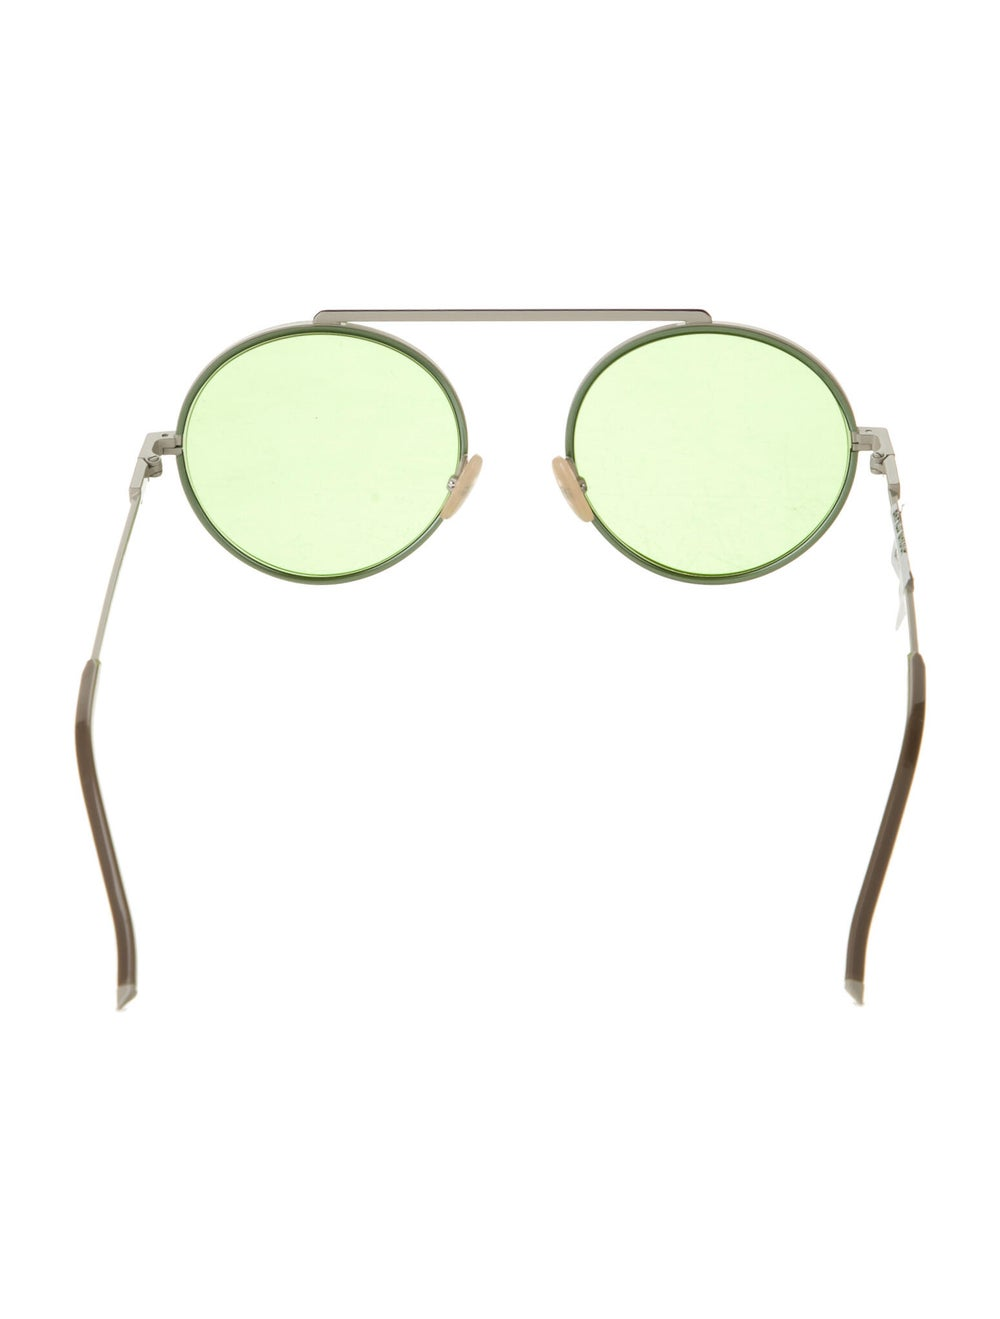 Fendi Round Tinted Sunglasses - image 3